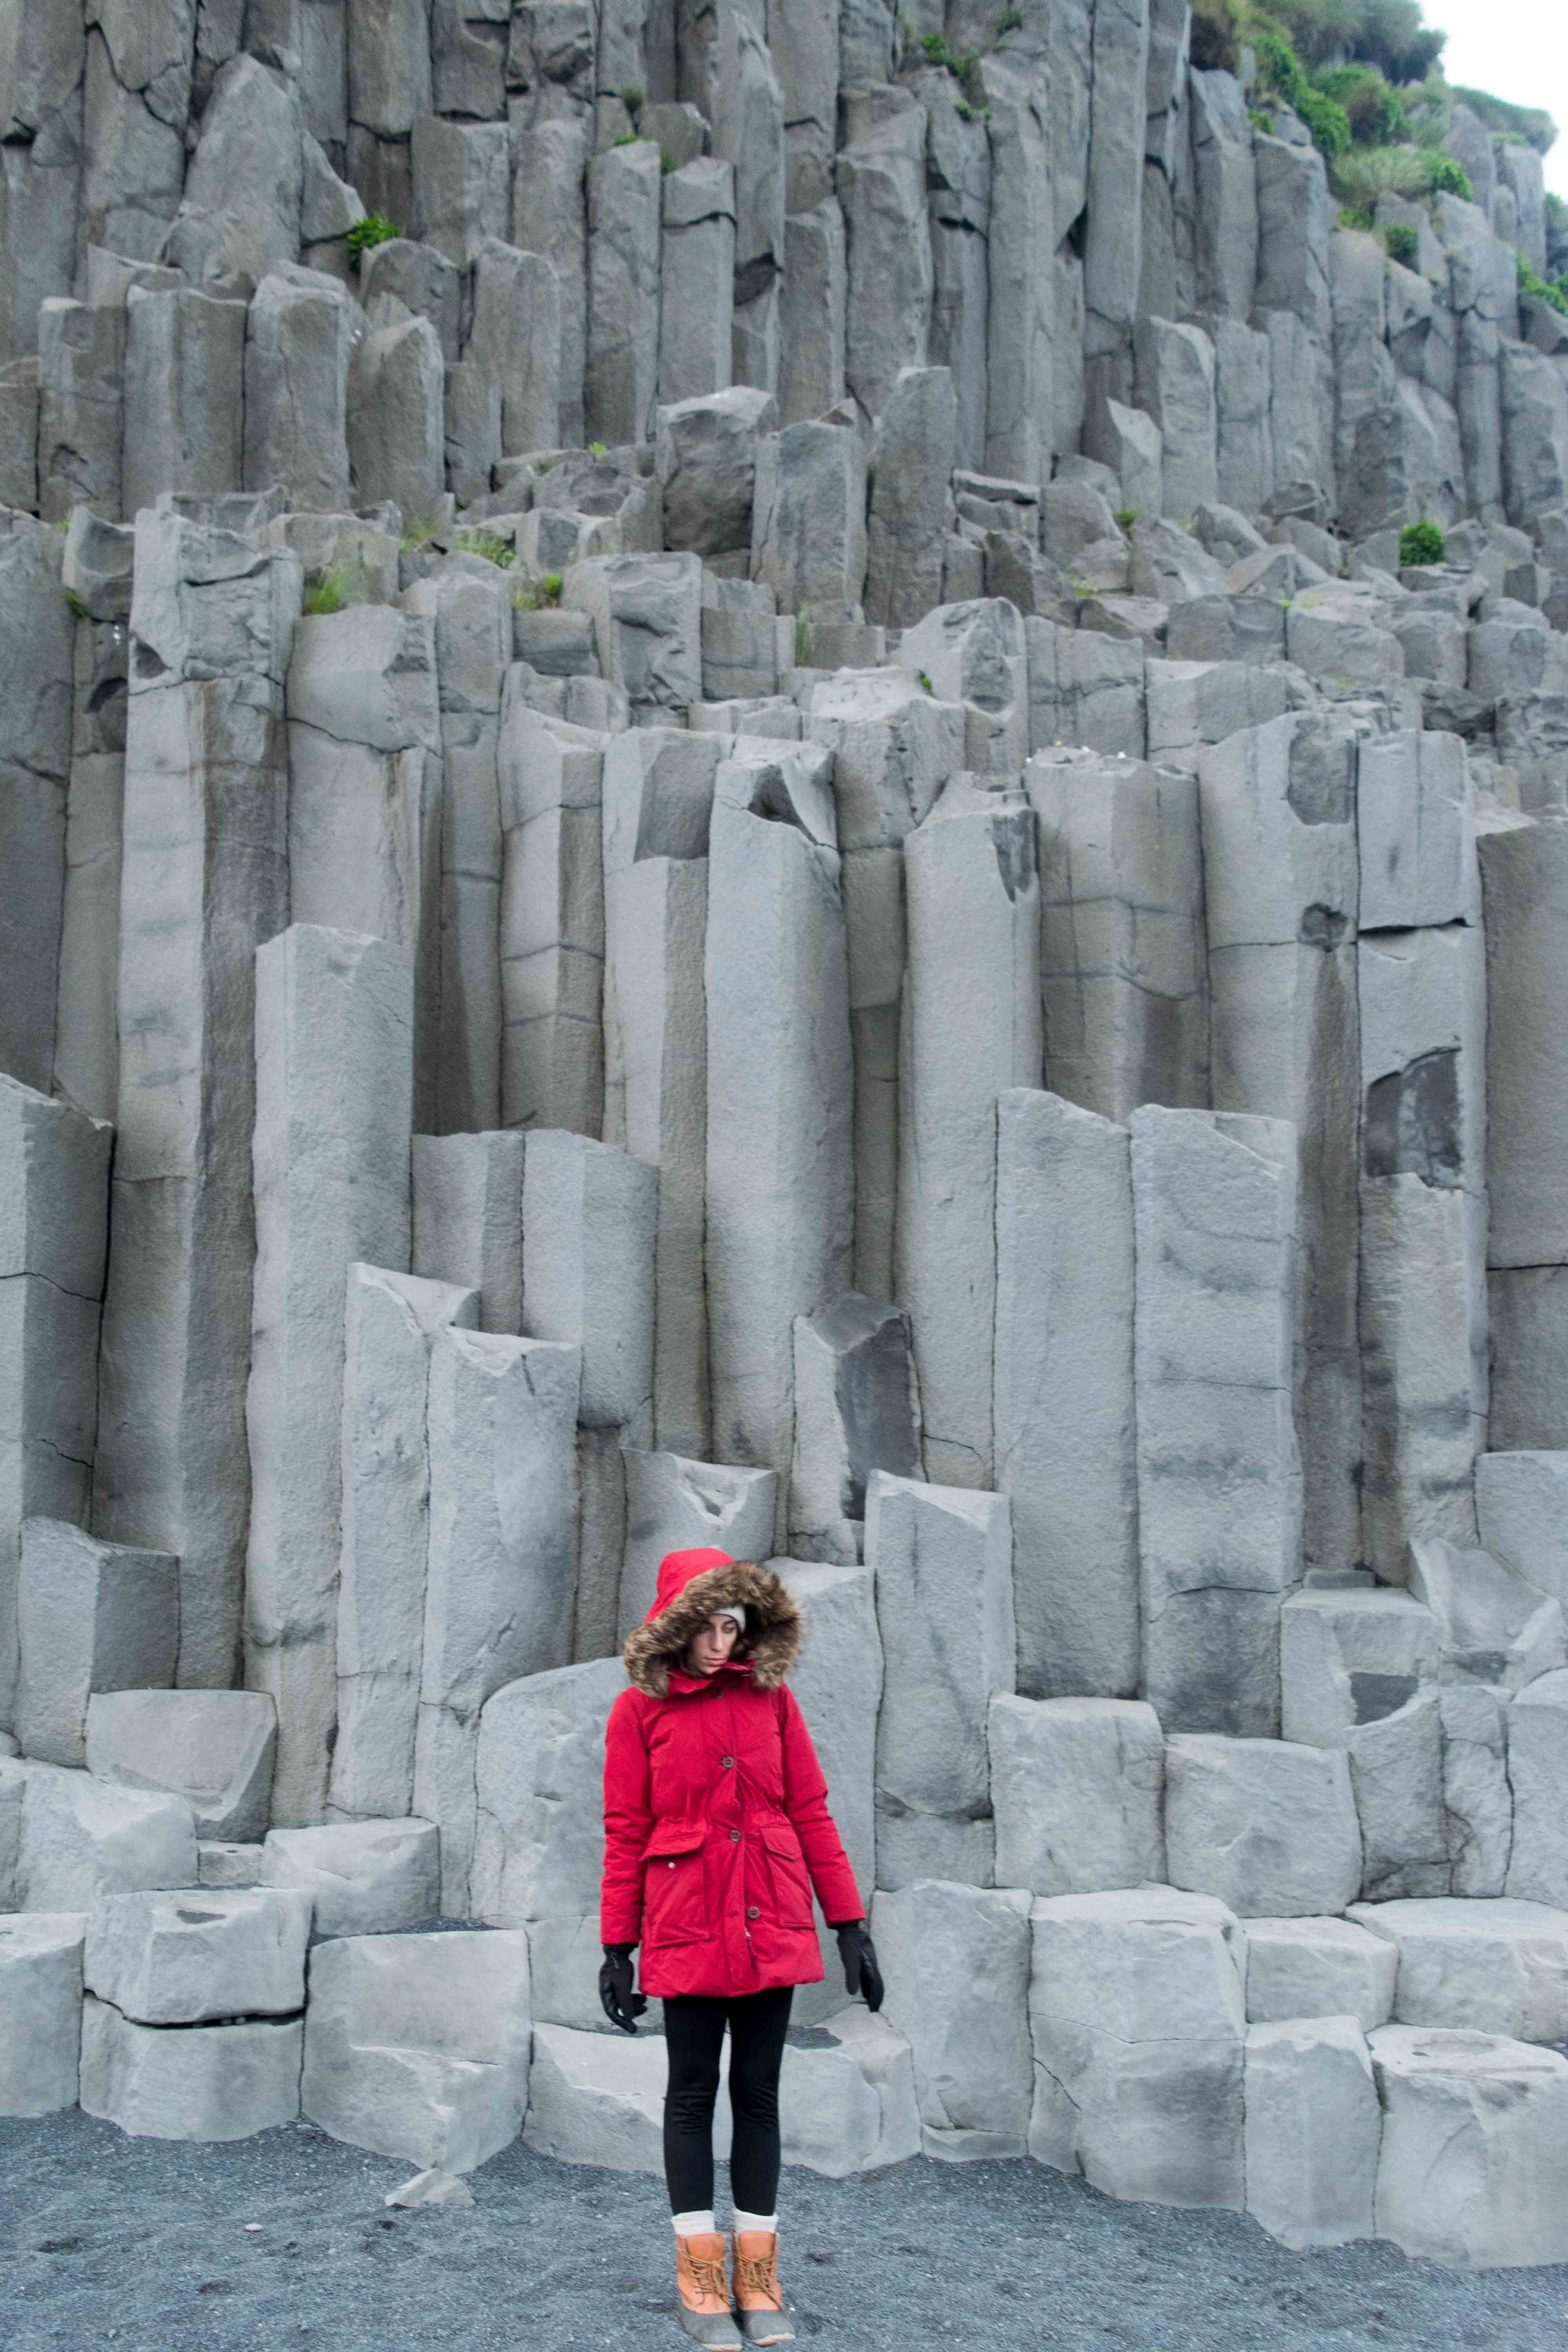 Rock formation Iceland